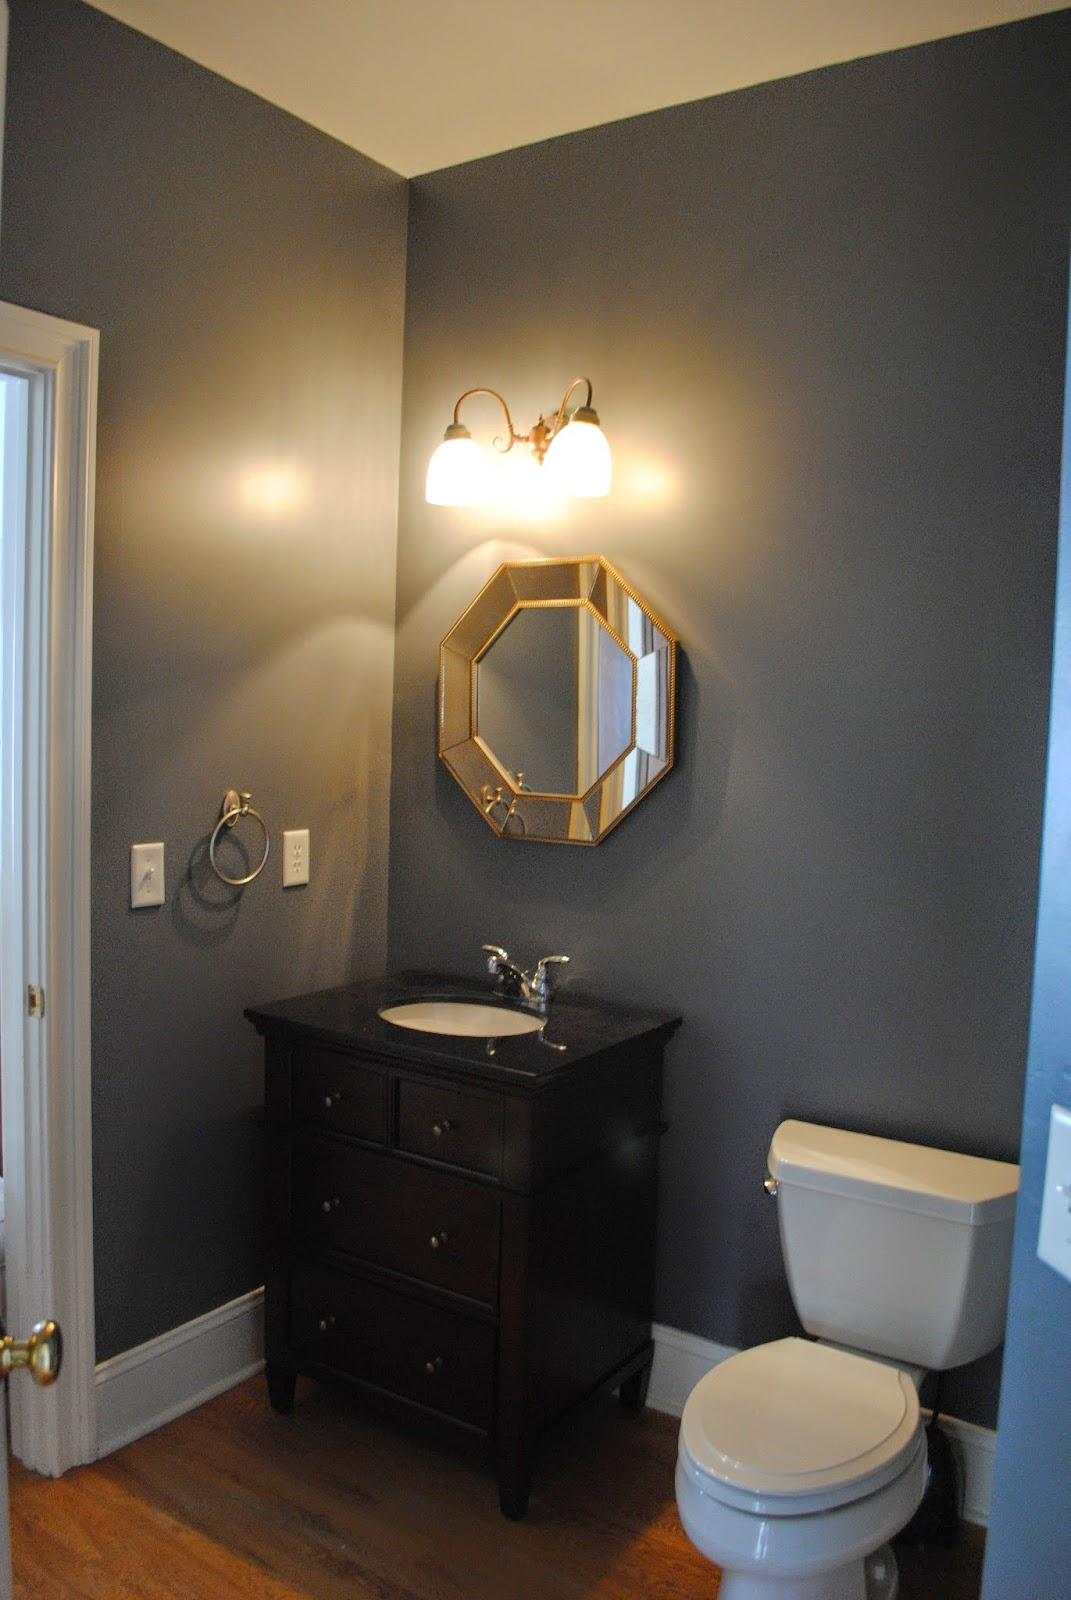 Teal And Gray Bathroom Ideas Desk Bathroom Accessories